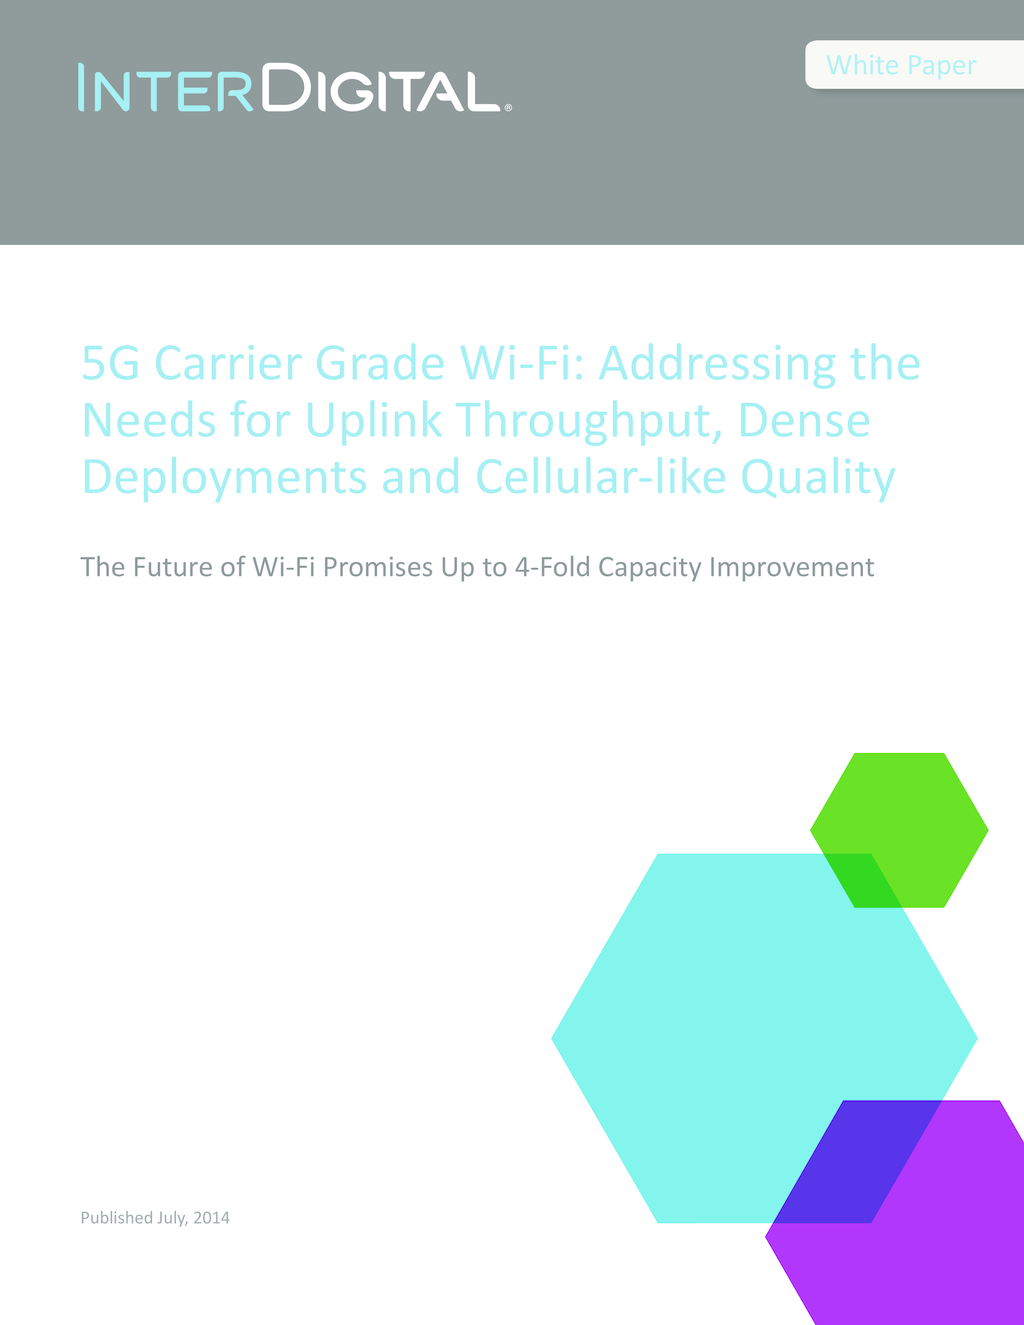 5G Carrier Grade Wi-Fi: Addressing the Needs for Uplink Throughput